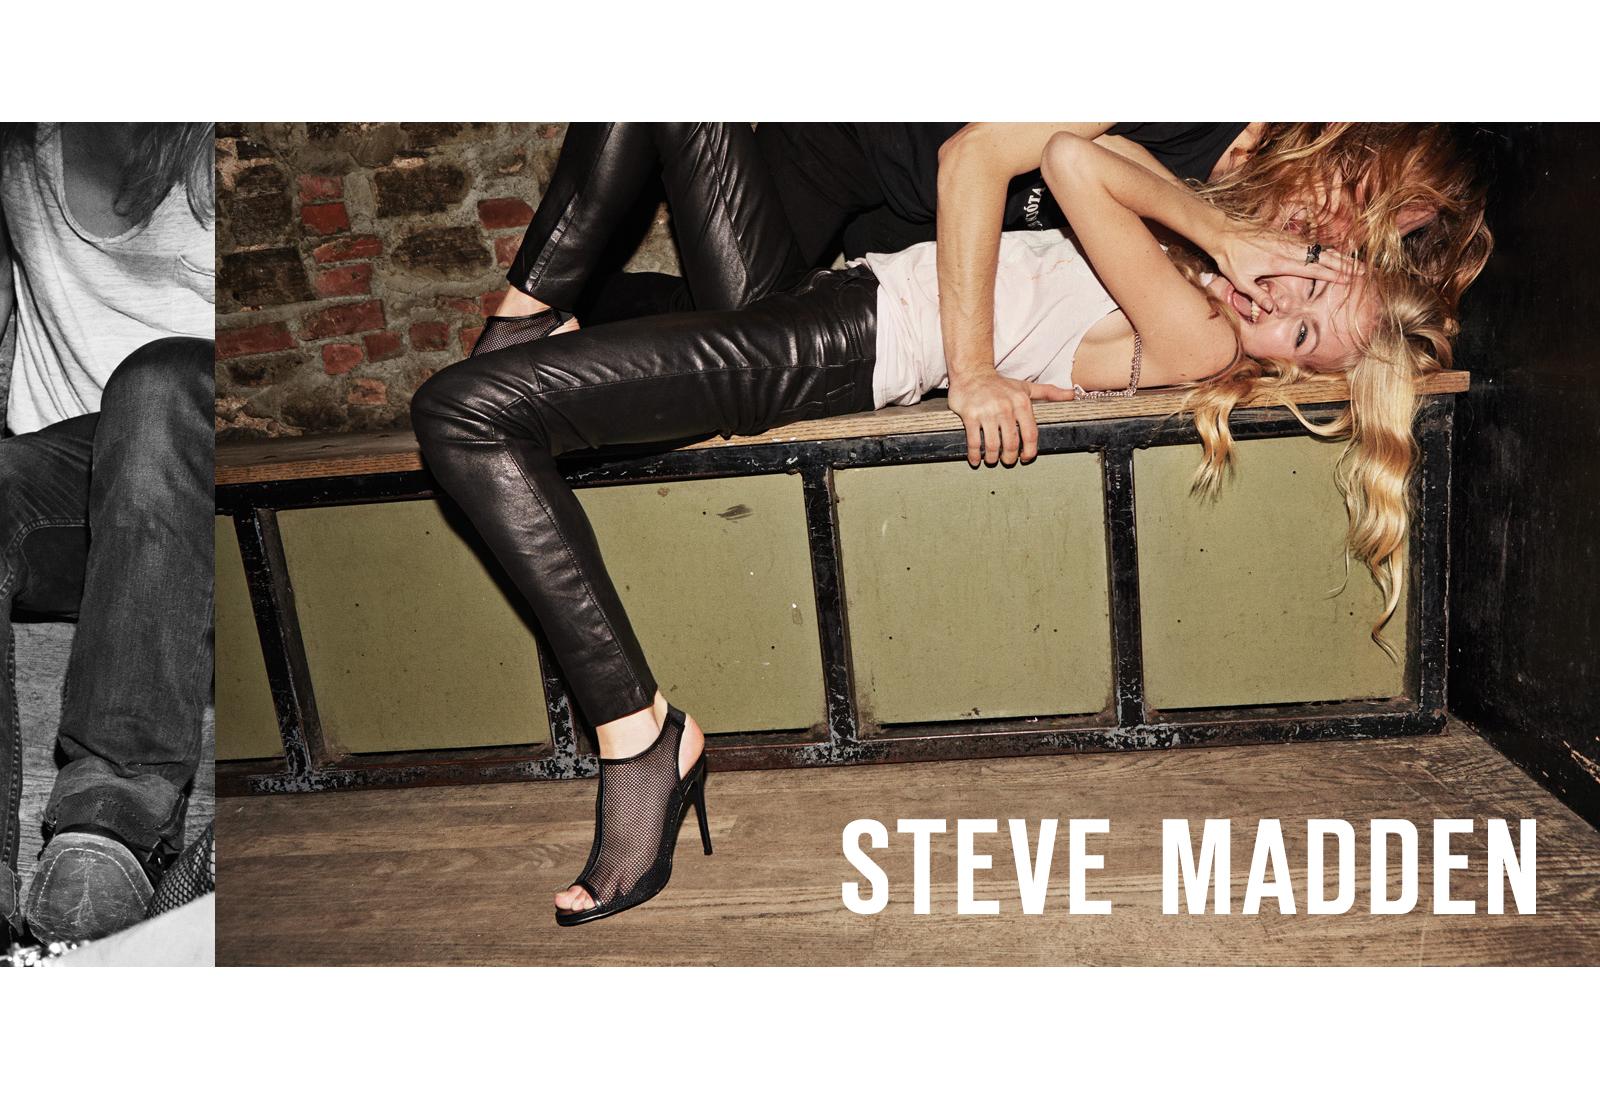 STEVE_MADDEN_Magdalena_Wosinka_1.jpg